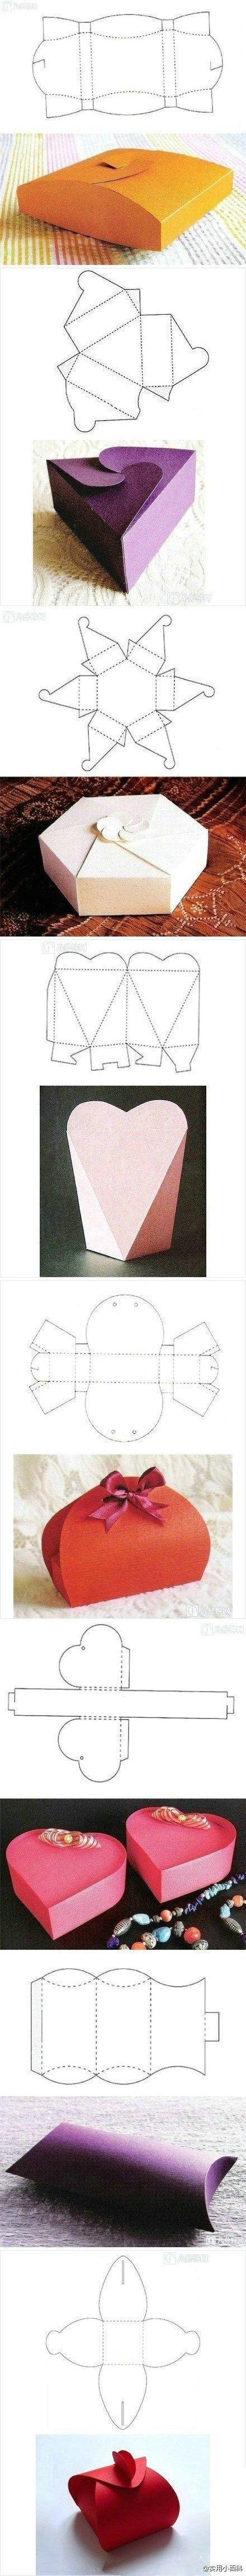 Eight creative gift box foldings. [Sang]